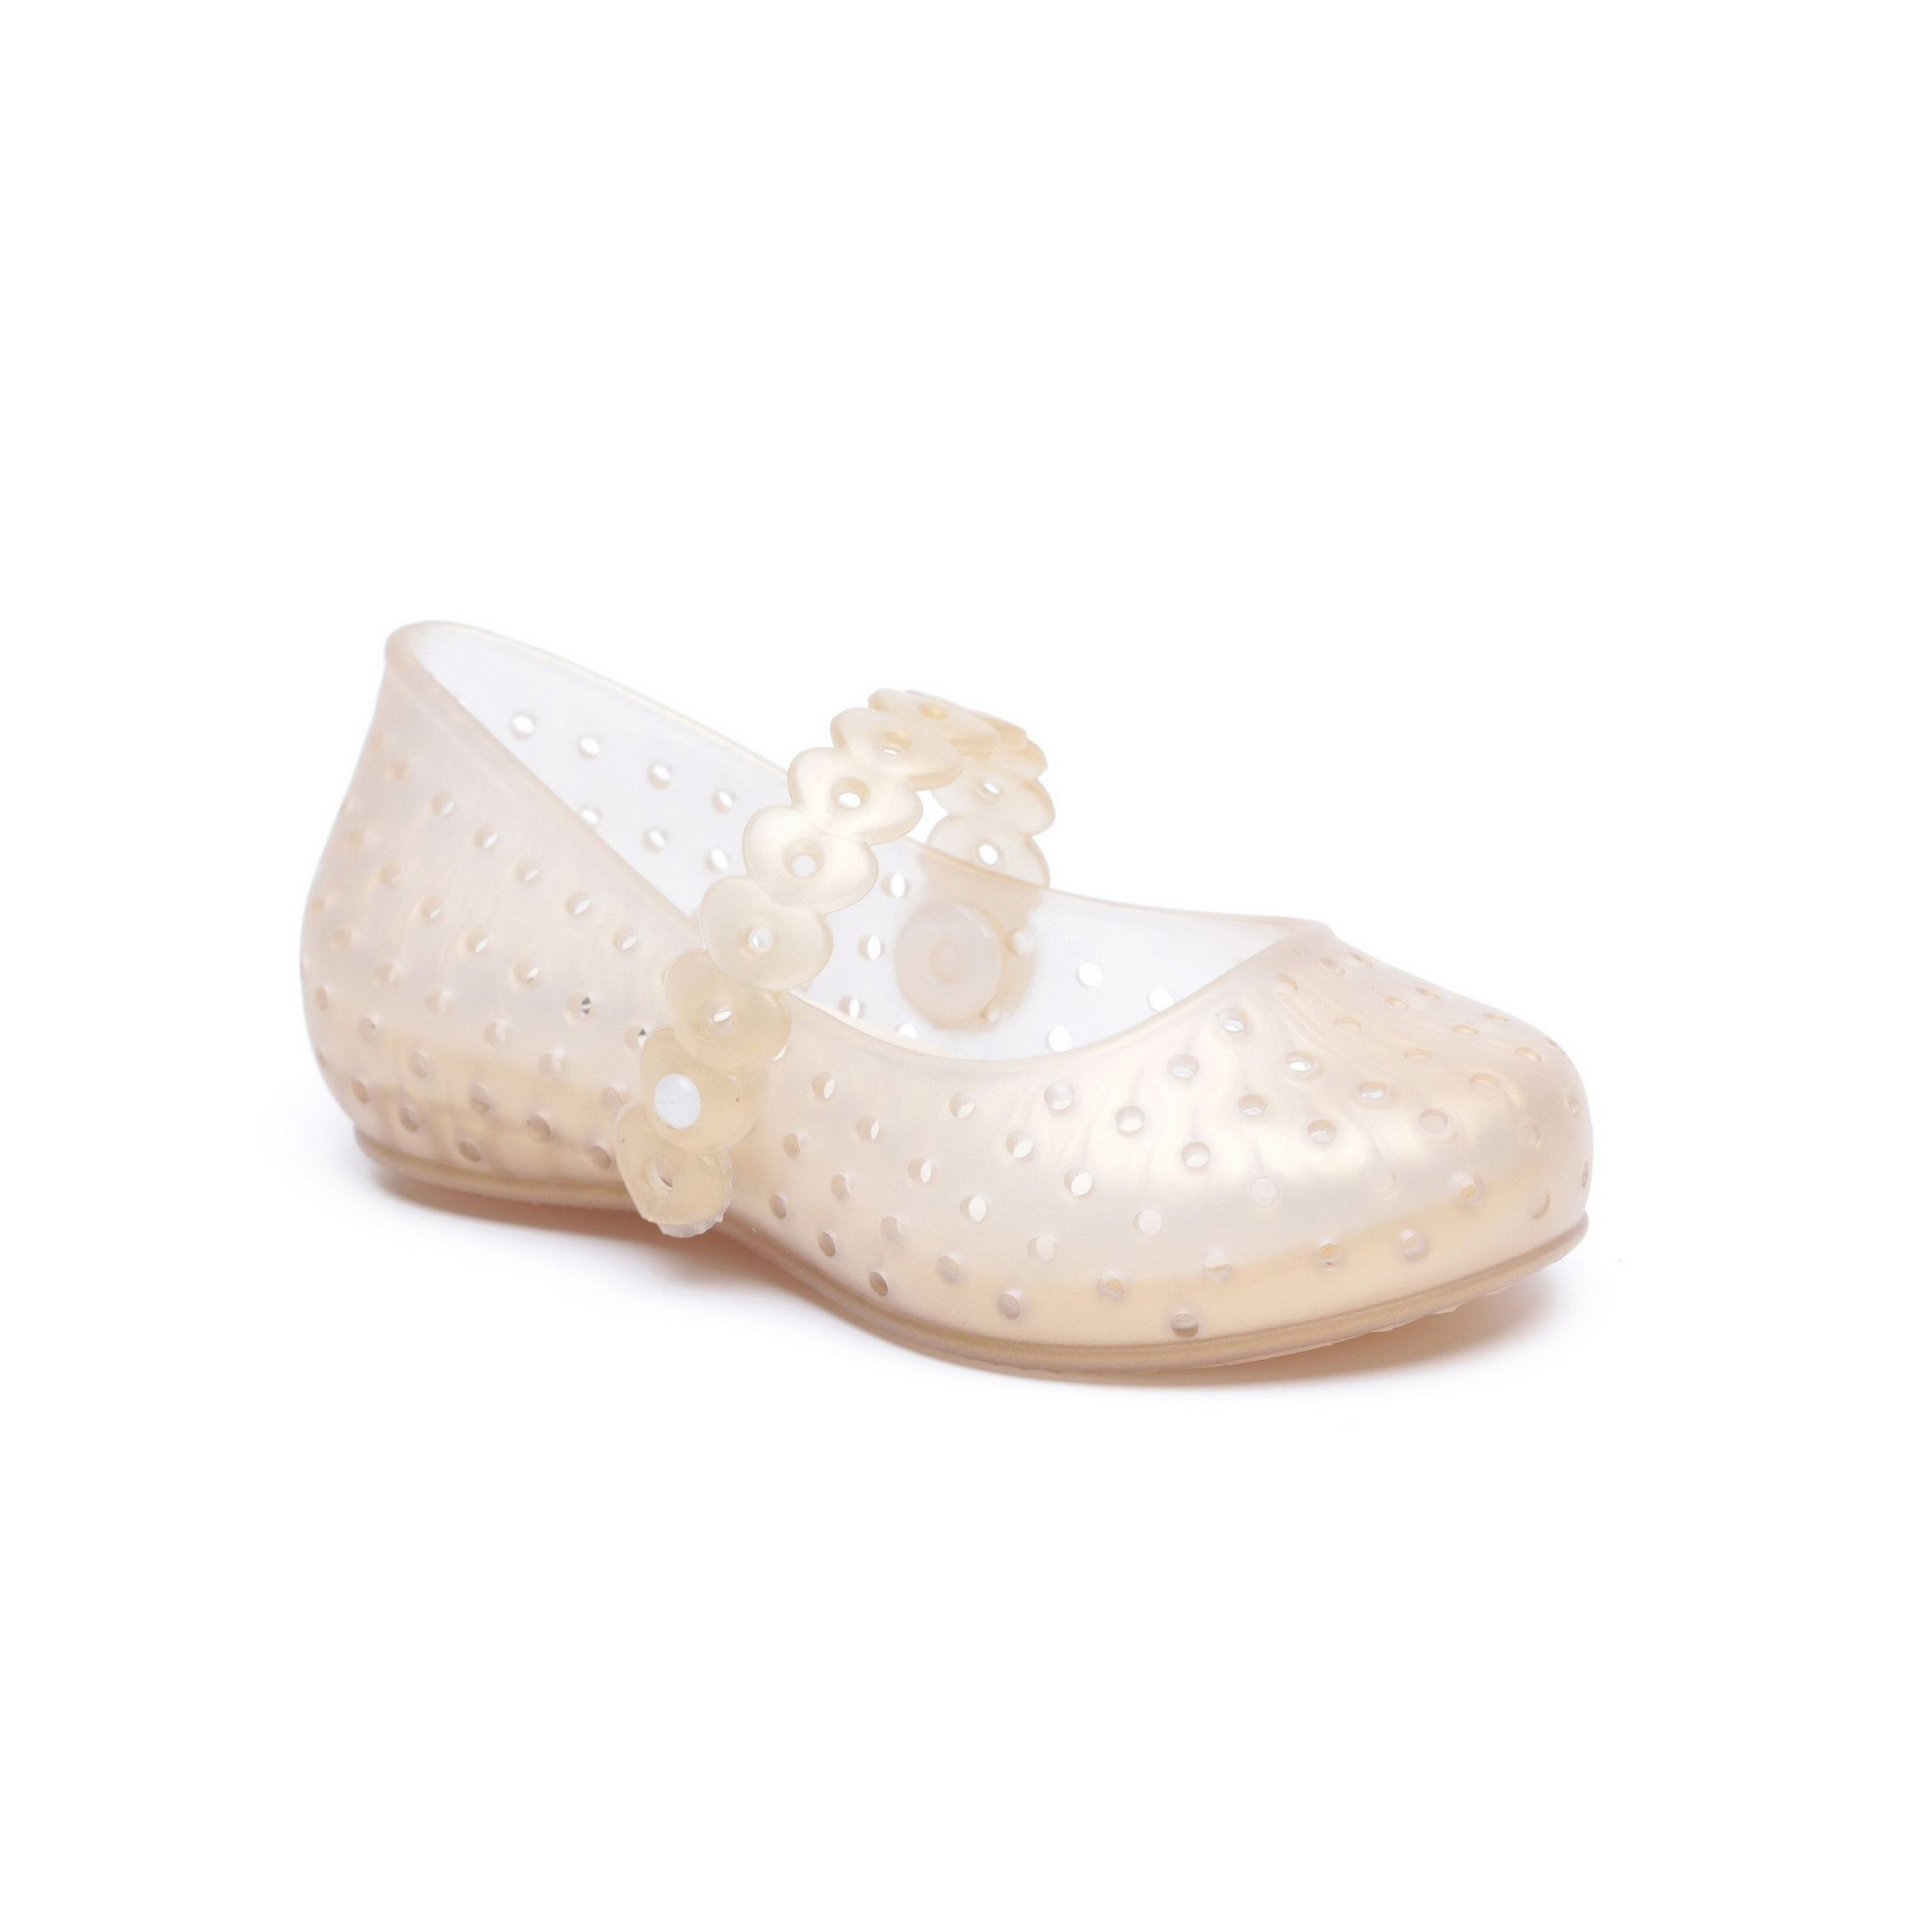 Candy - נעלי בובה אווריריות בצבע זהב